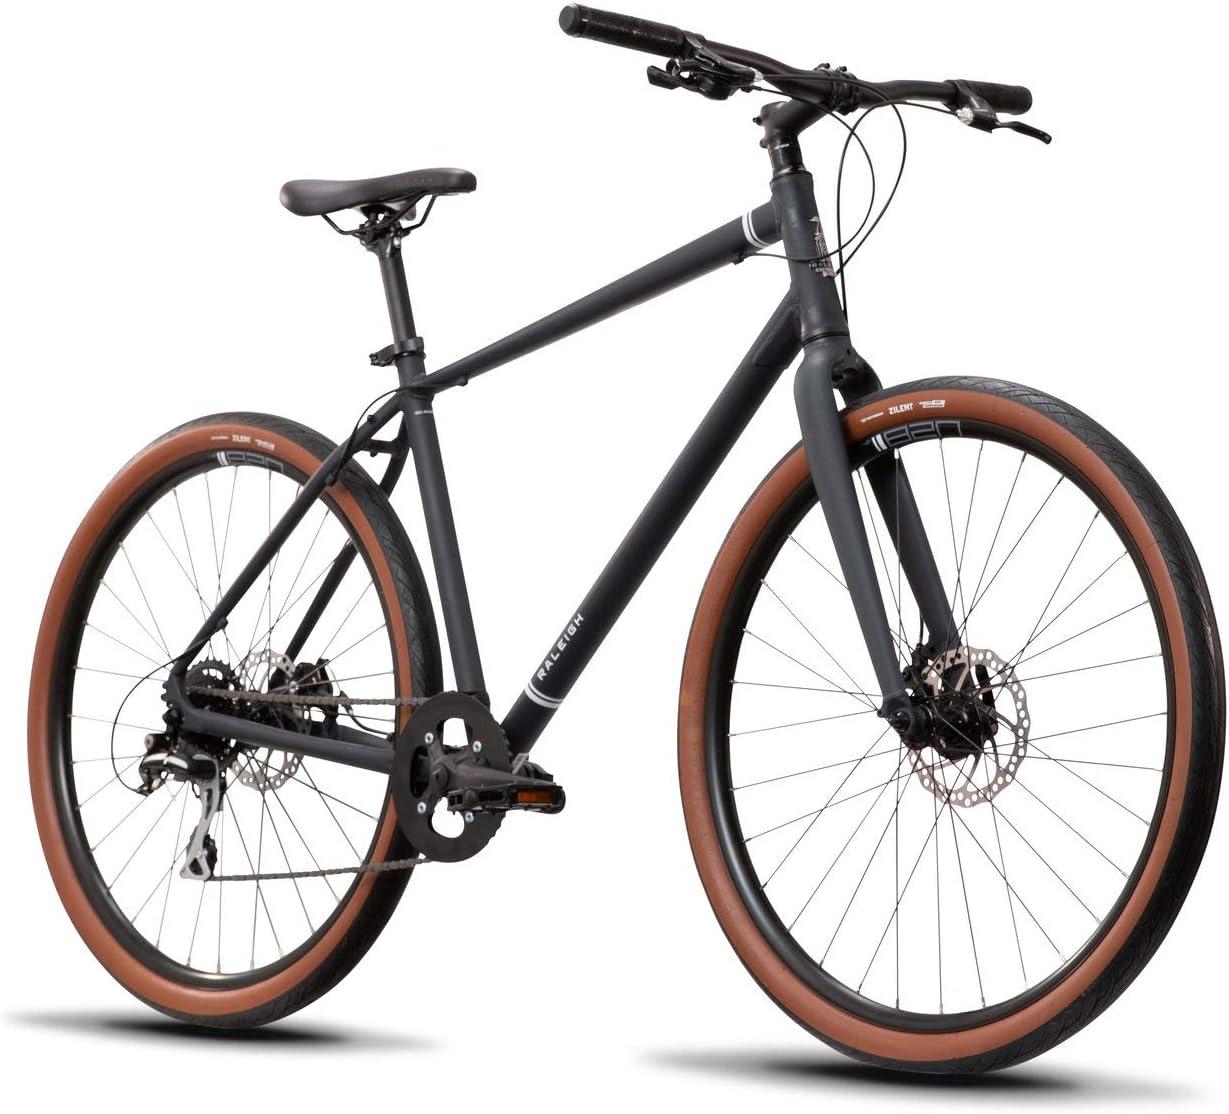 Raleigh Bikes Redux Heavy Riders Hybrid Bike